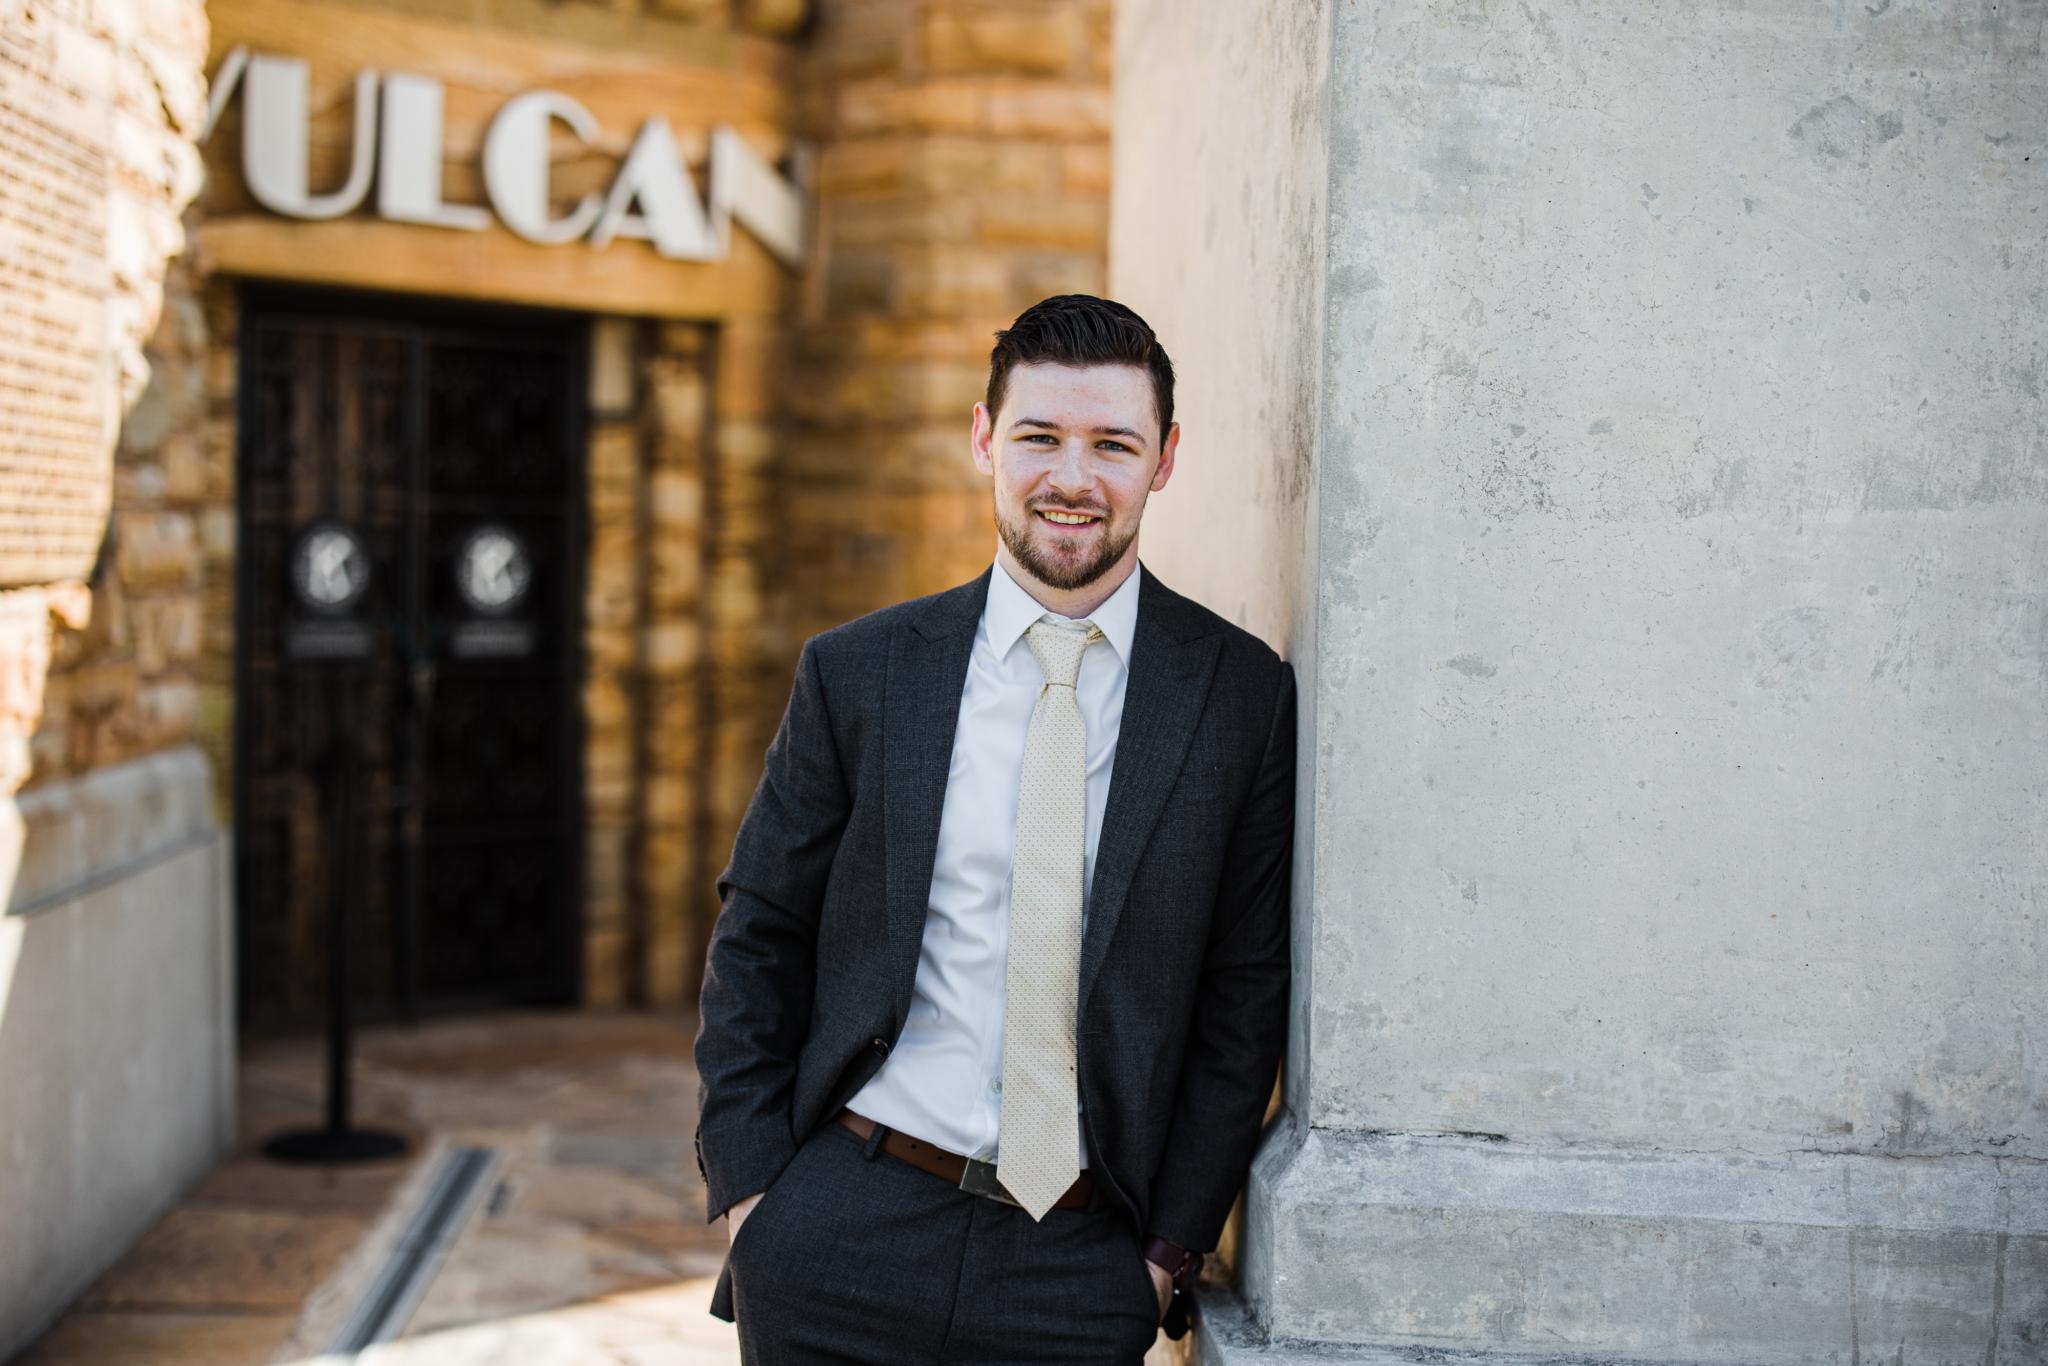 This Birmingham financial advisor will help finance your dream life